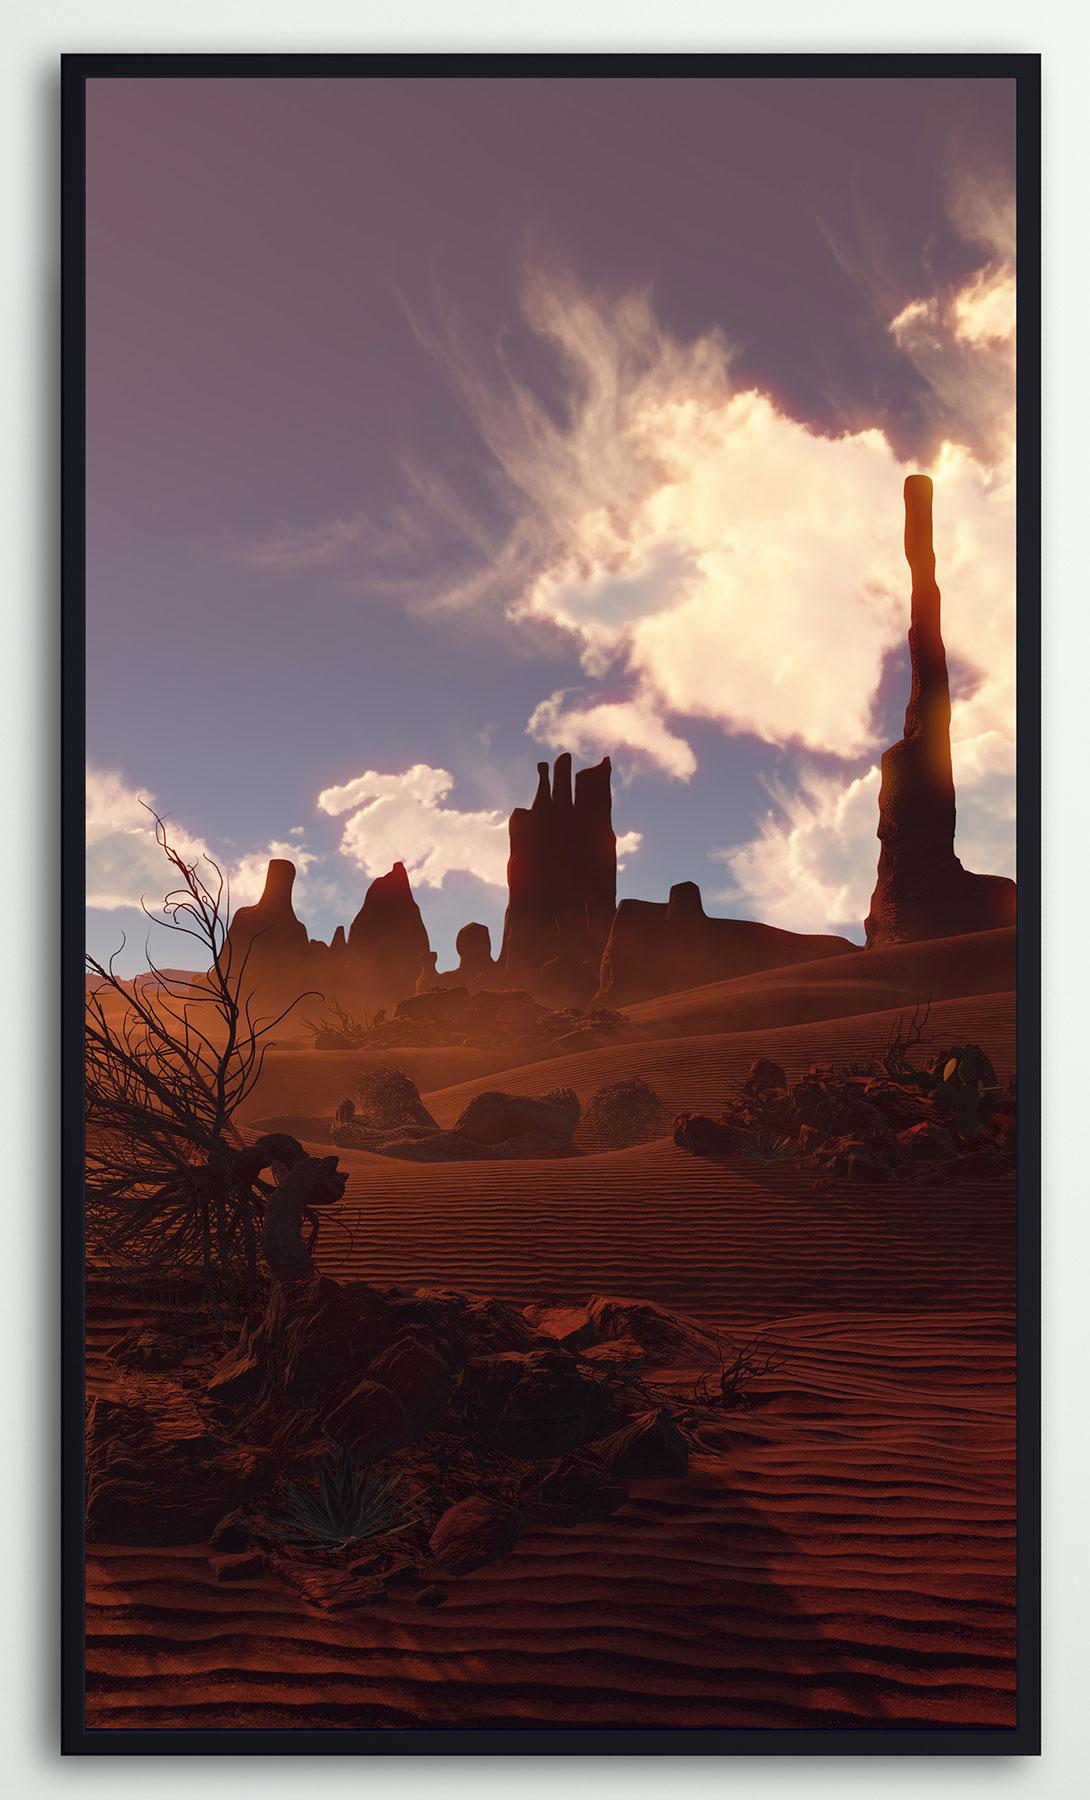 Deserted: Monument Valley